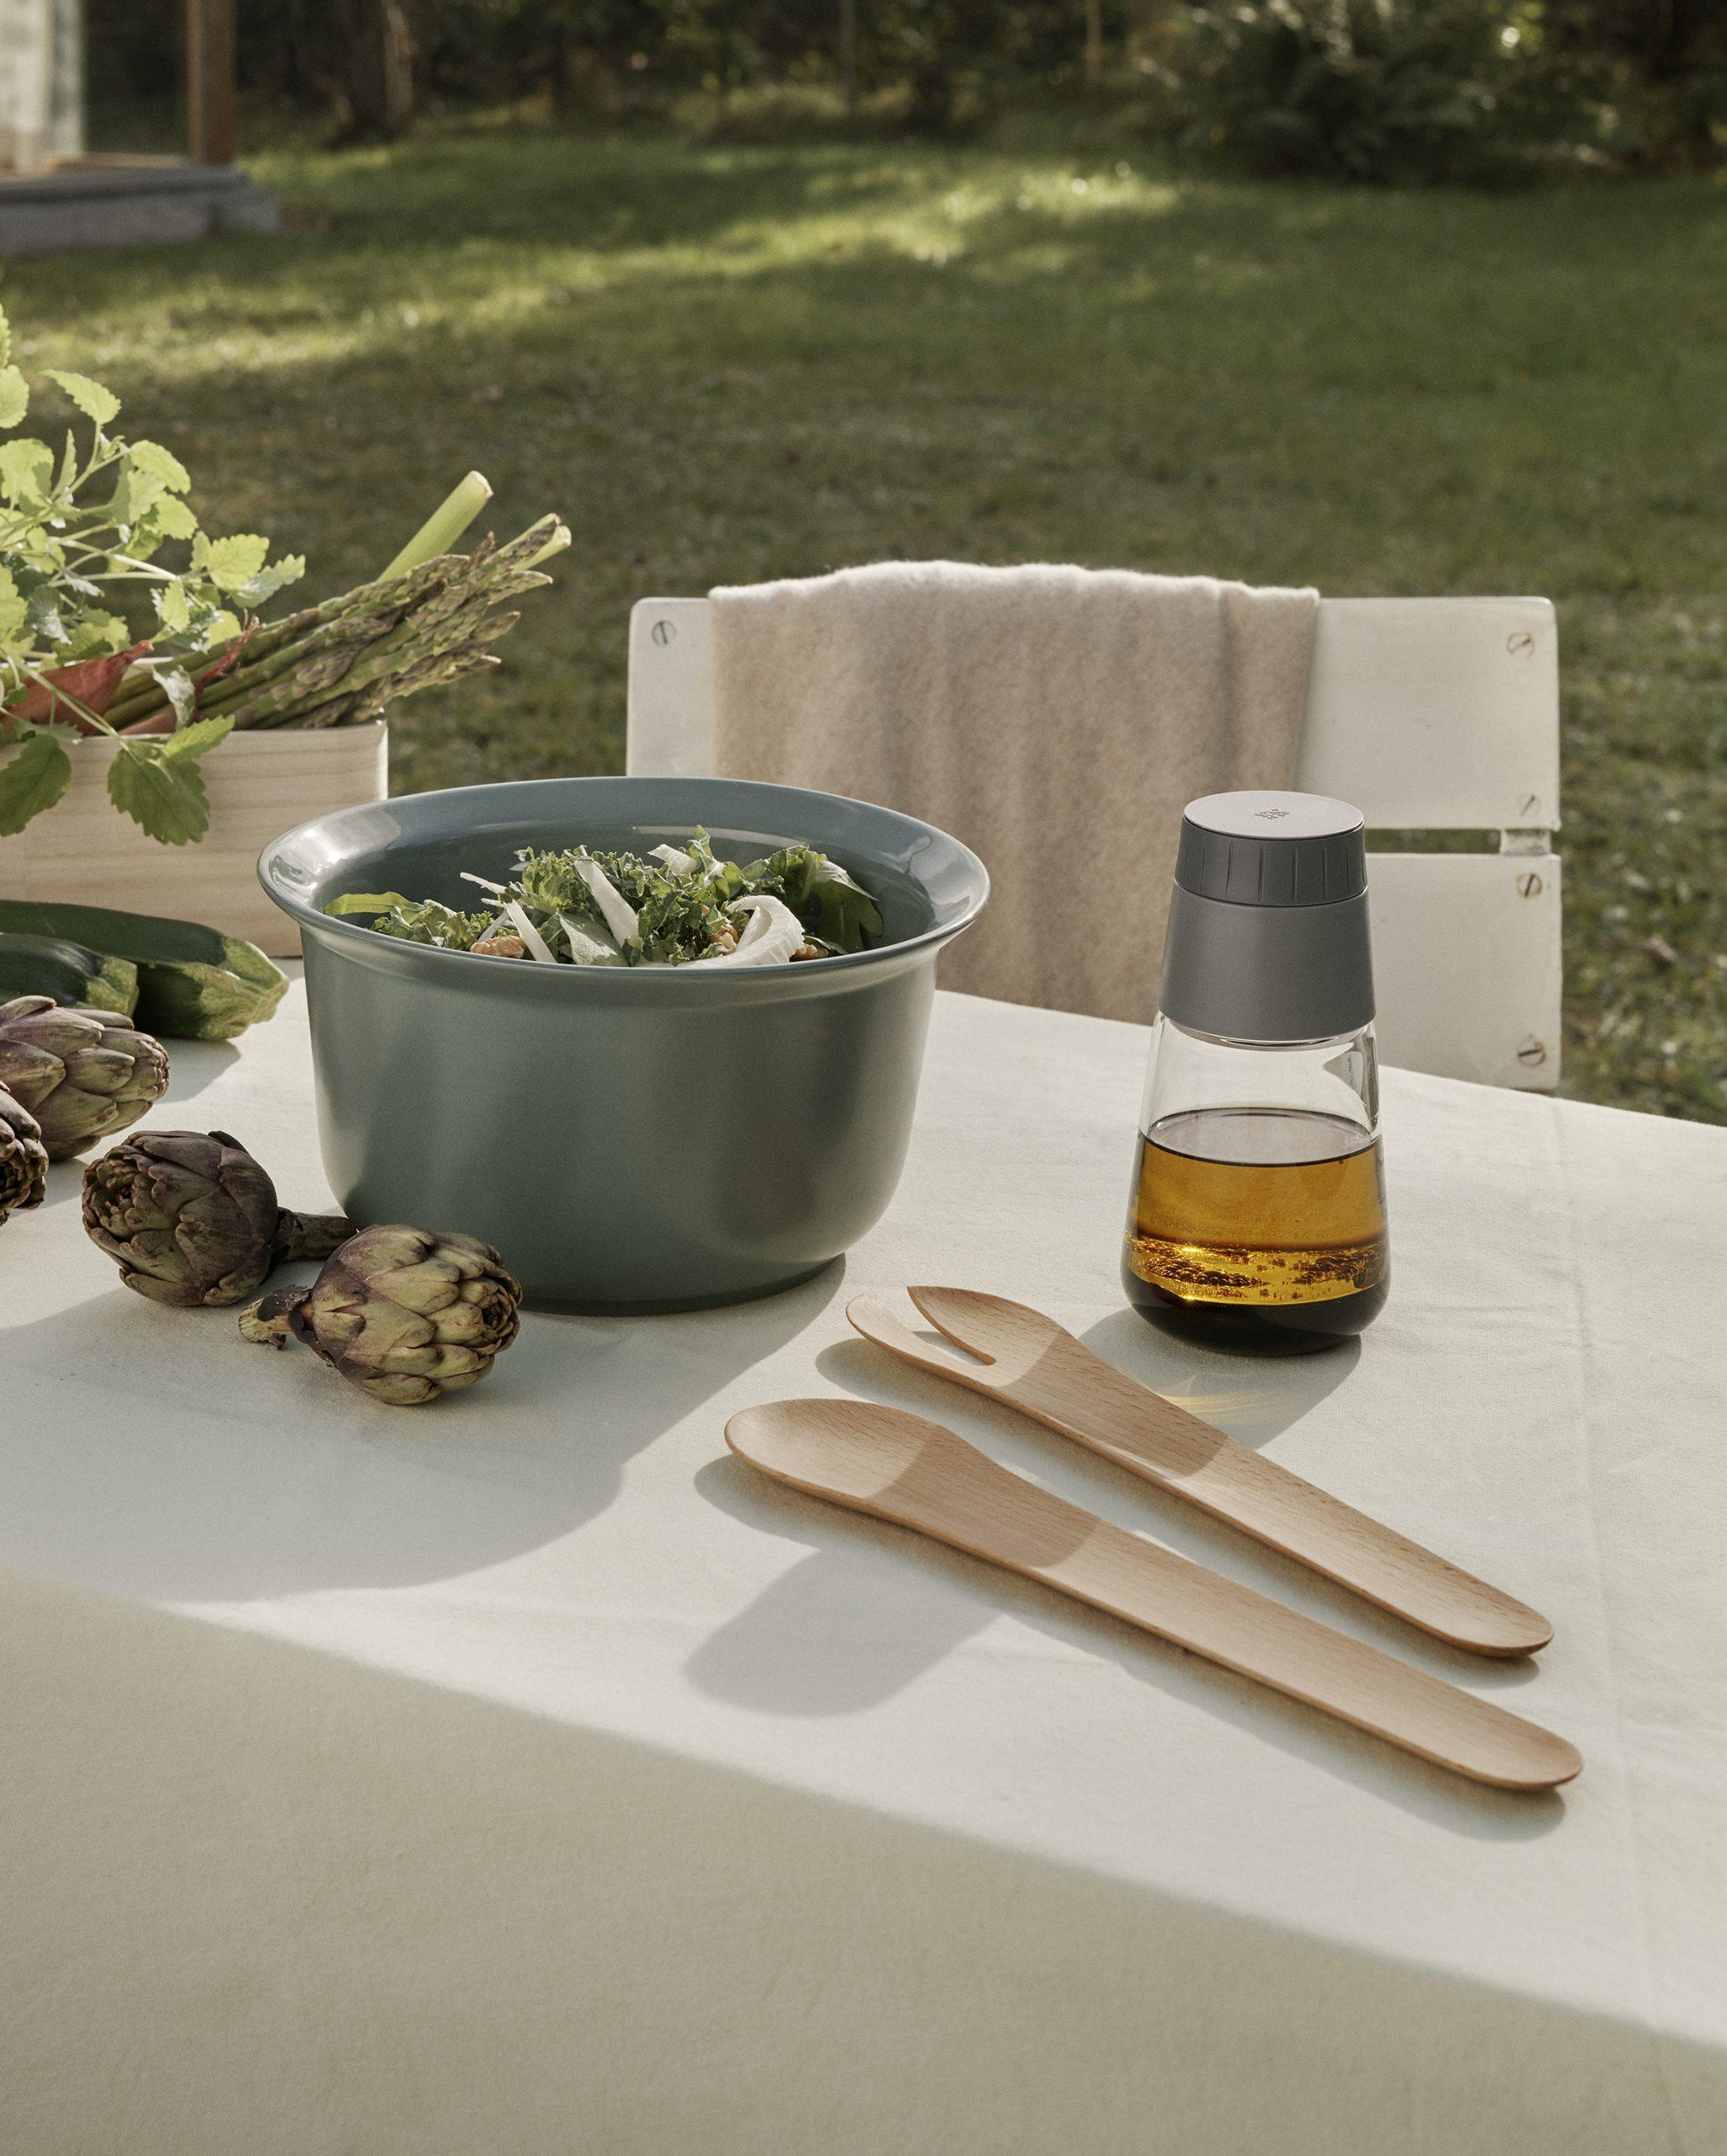 Toss It wooden salad servers by Debiasi Sandri for RigTig